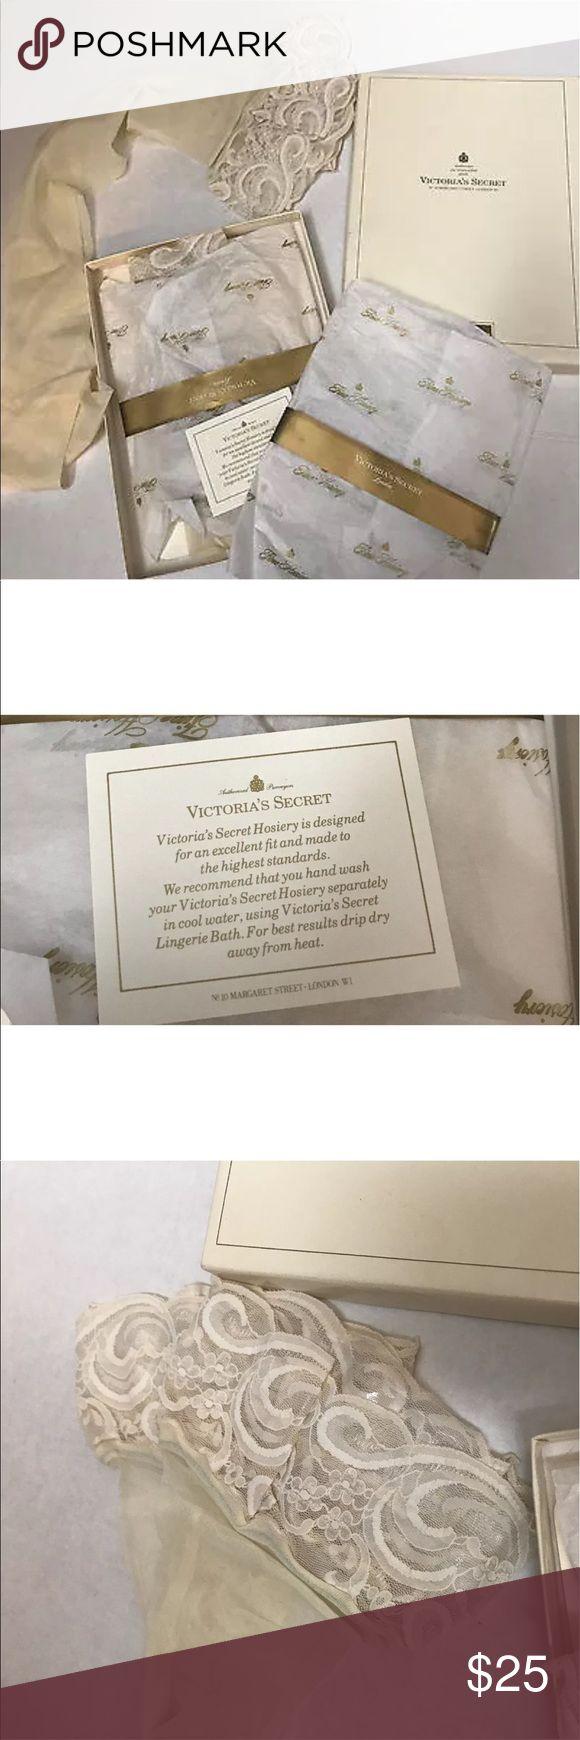 New old stock Victoria's Secret stockings in box Vintage New old stock box of Victoria's secret thigh highs 2 pairs Cream Size Medium Victoria's Secret Intimates & Sleepwear Shapewear